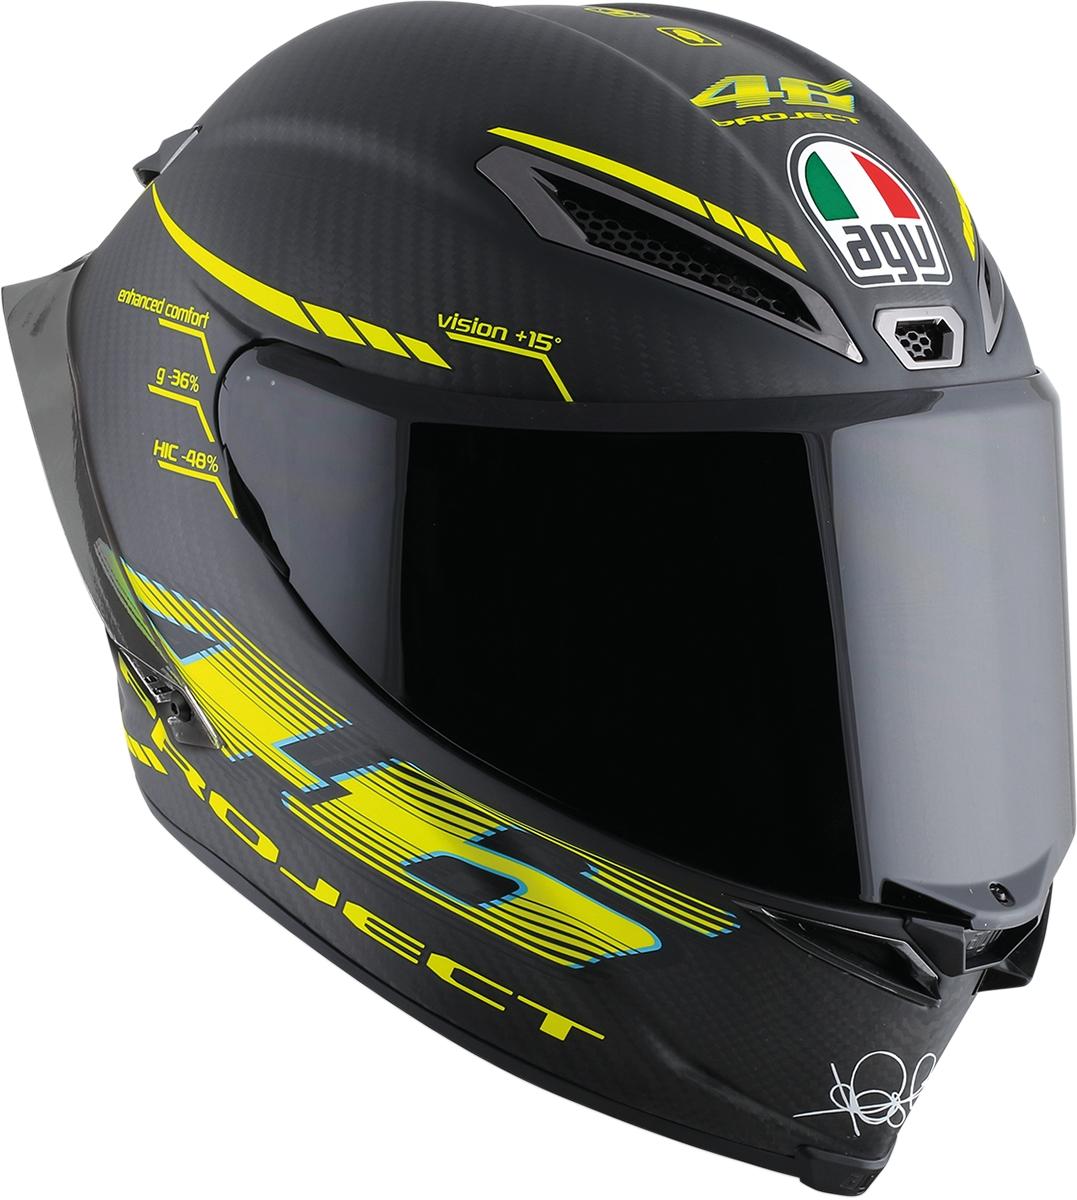 agv pista gp r carbon project 46 2 0 helmet all sizes ebay. Black Bedroom Furniture Sets. Home Design Ideas